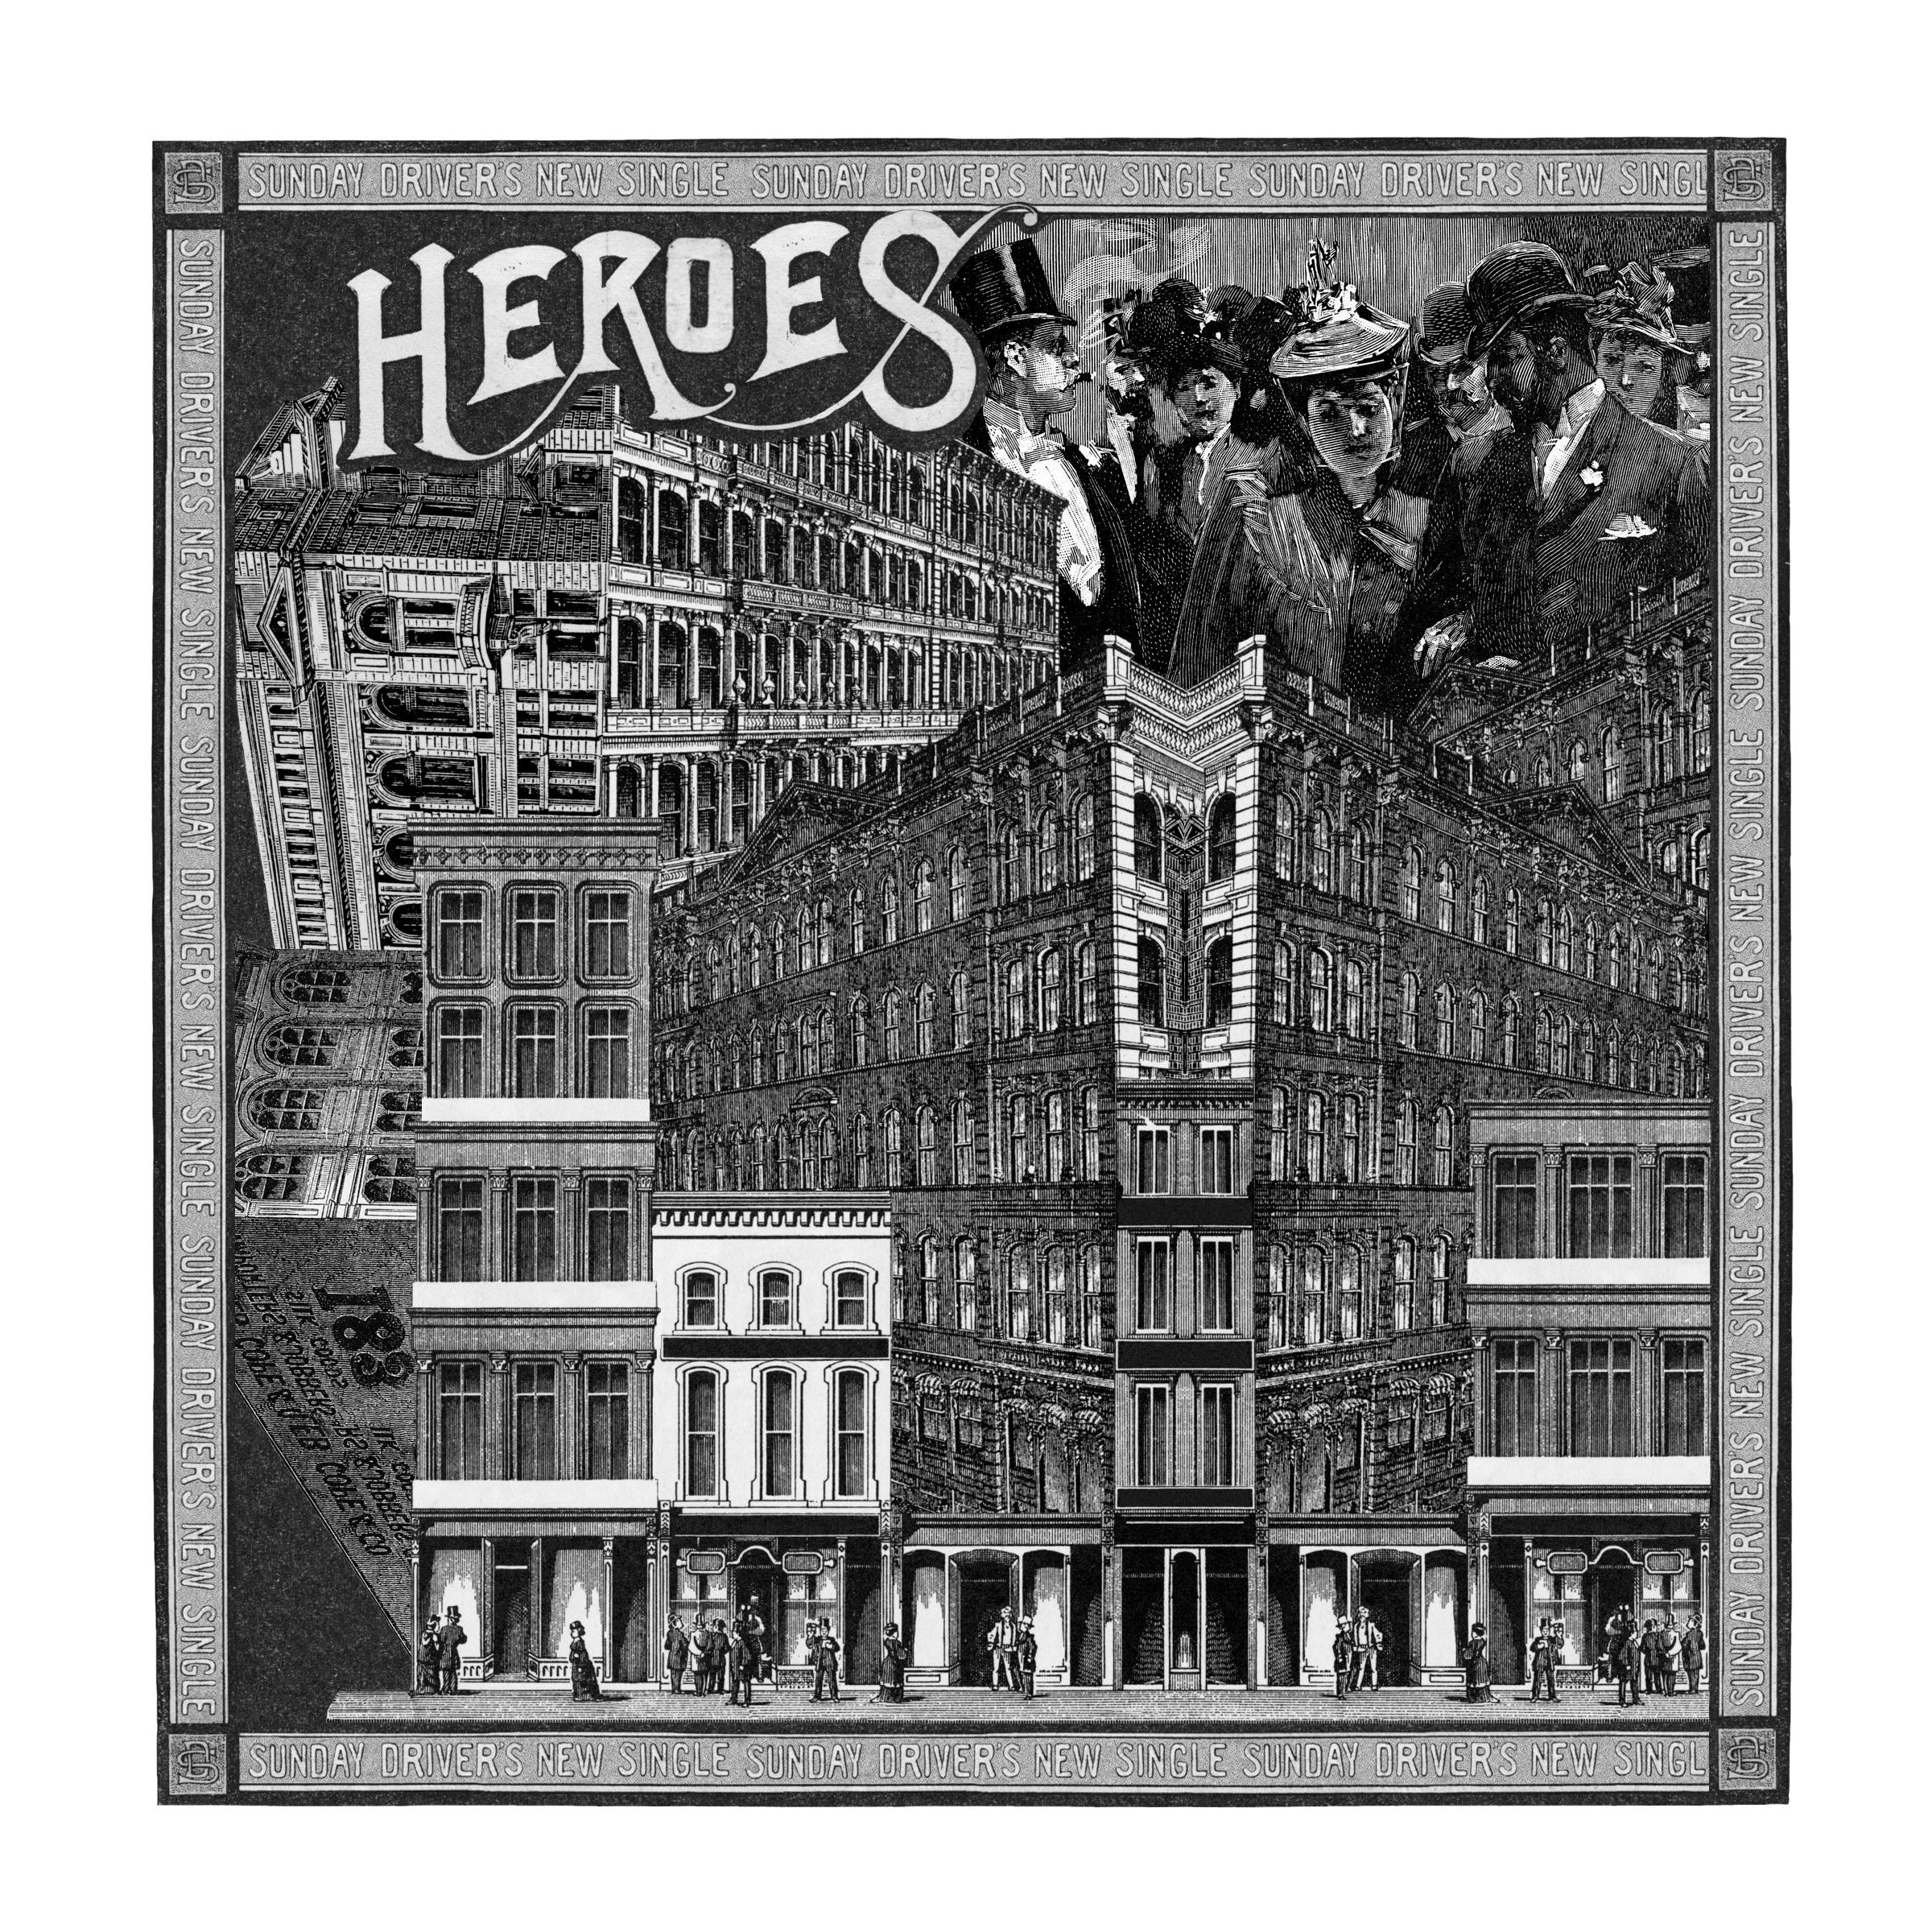 Heroes Hi-Quality Print